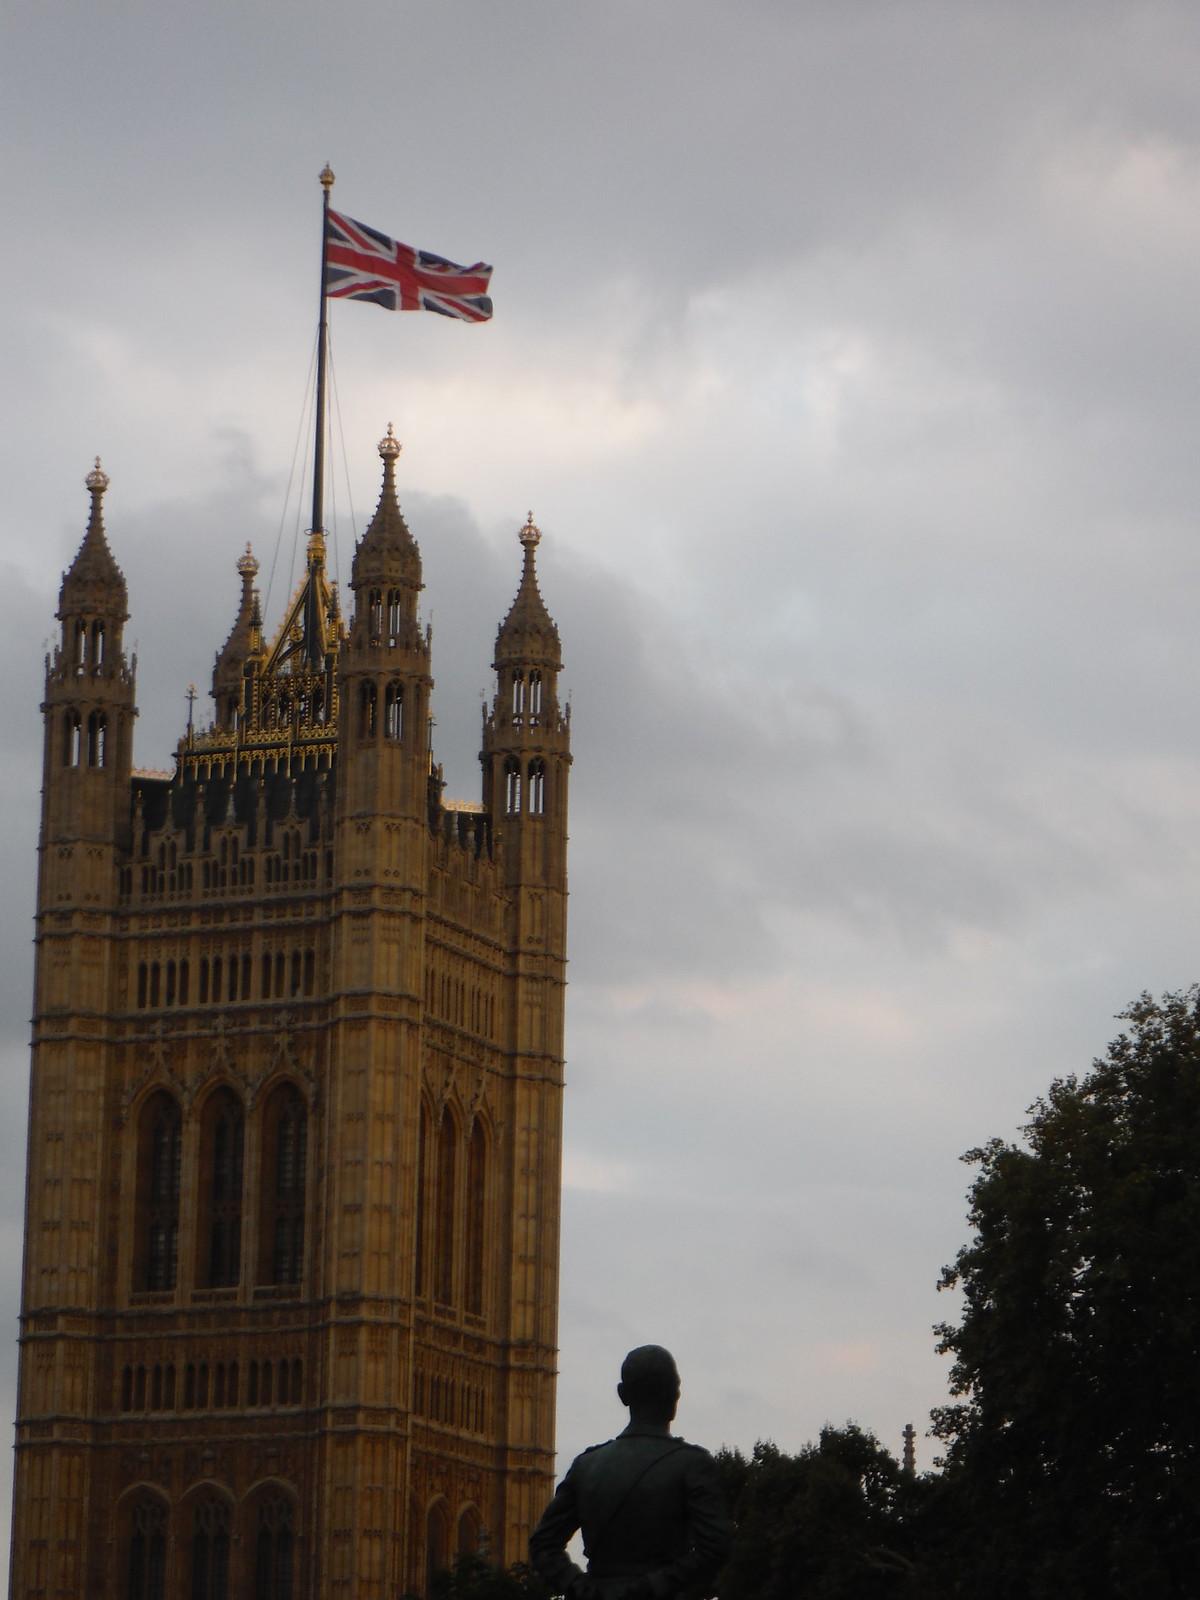 Houses of Parliament (detail) SWC Short Walk 19 - Royal Parks